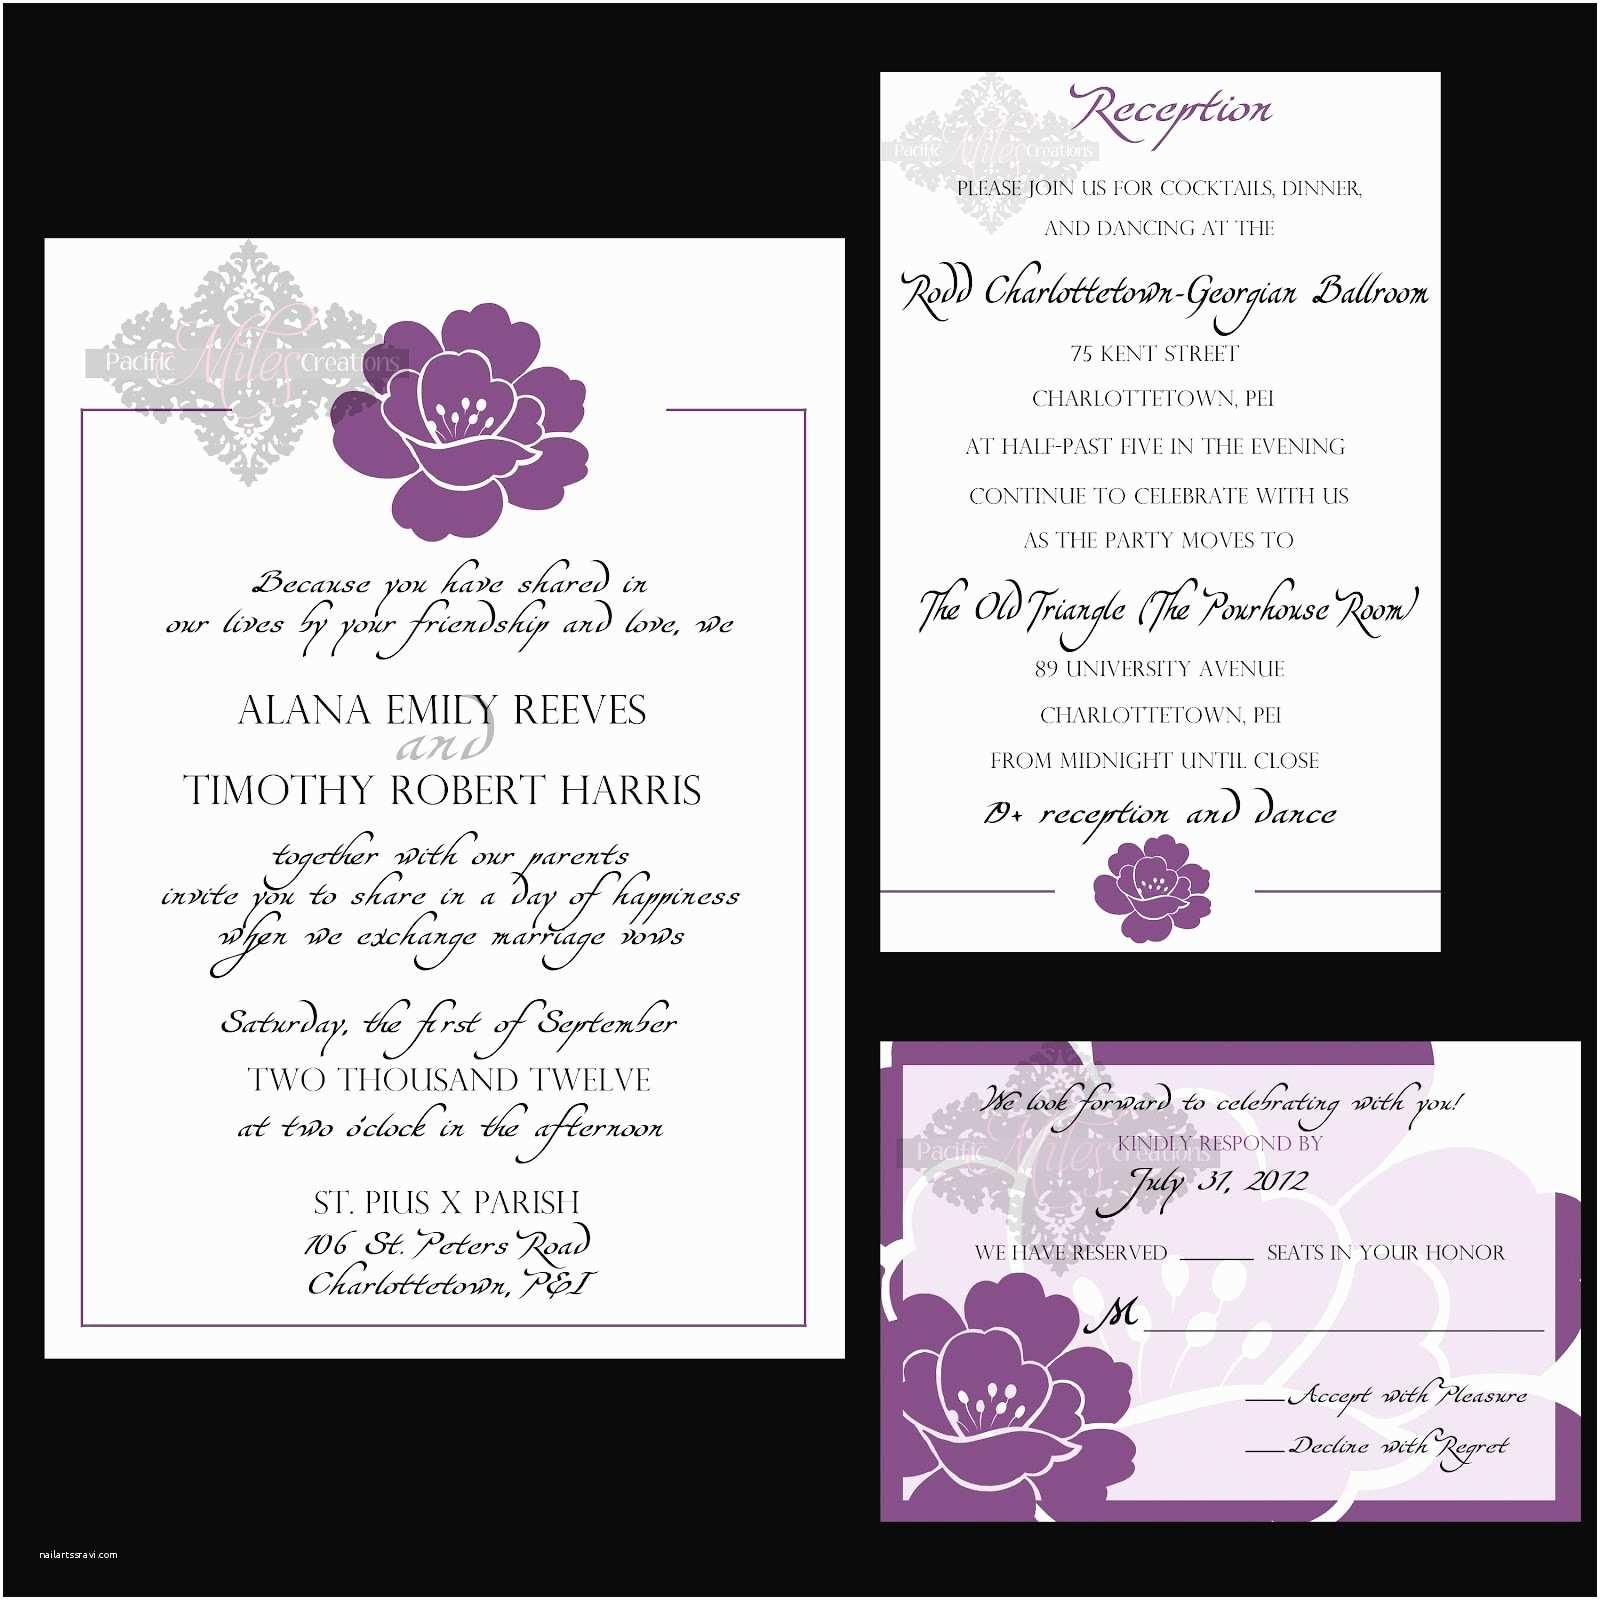 Wedding Invitation Dress Code Wedding Dress Code Wording Smart Casual Wedding